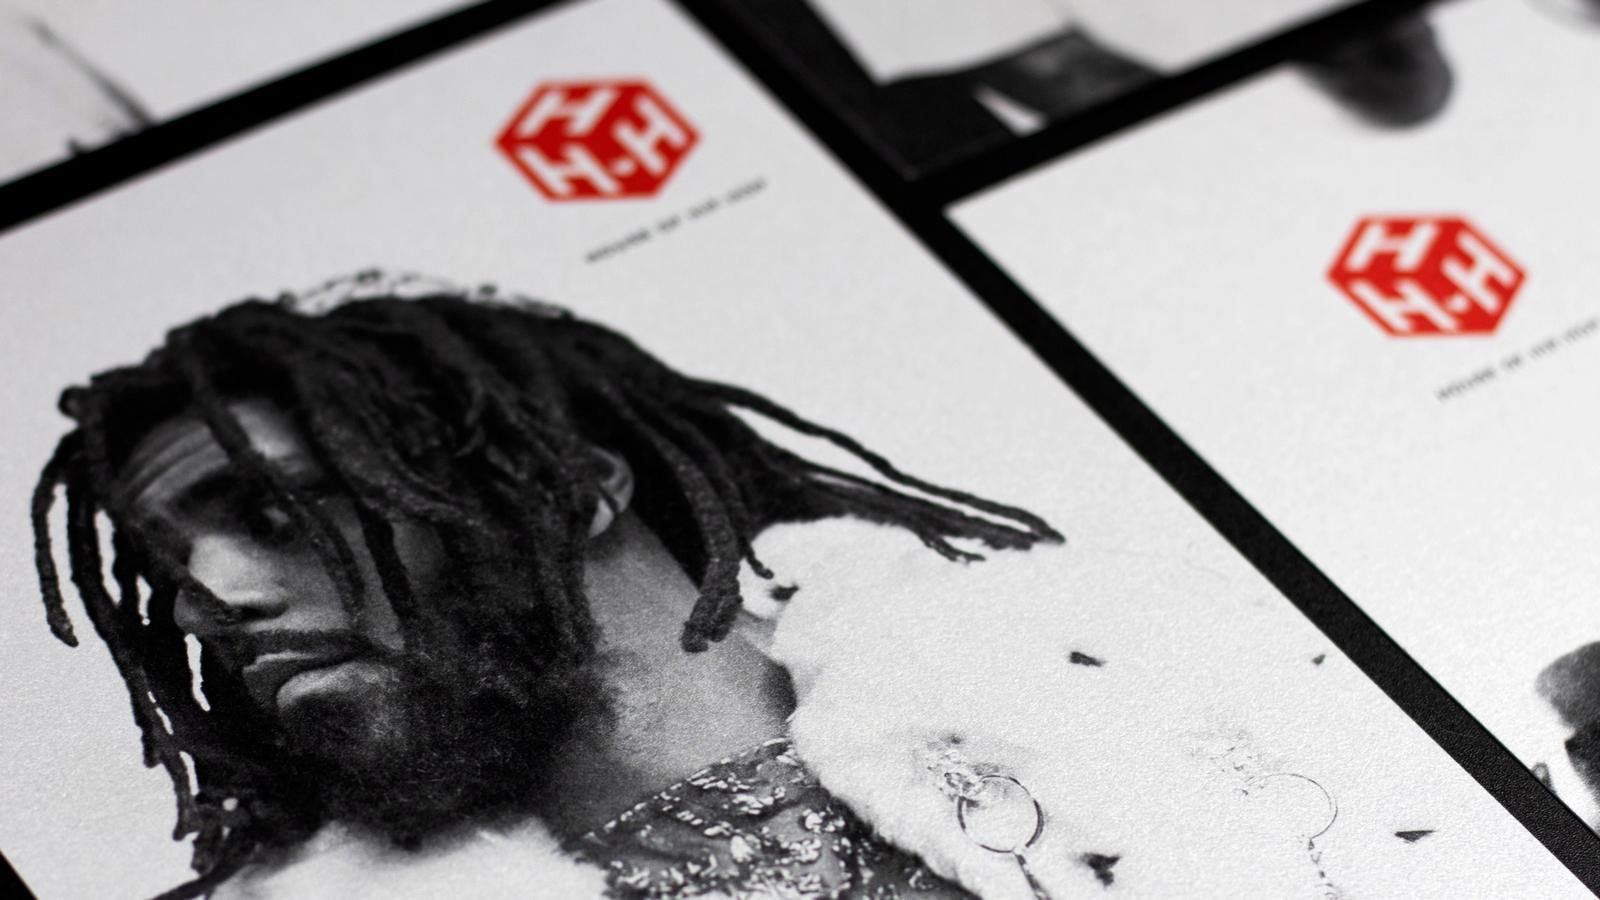 House of Hip-Hop // Branding System